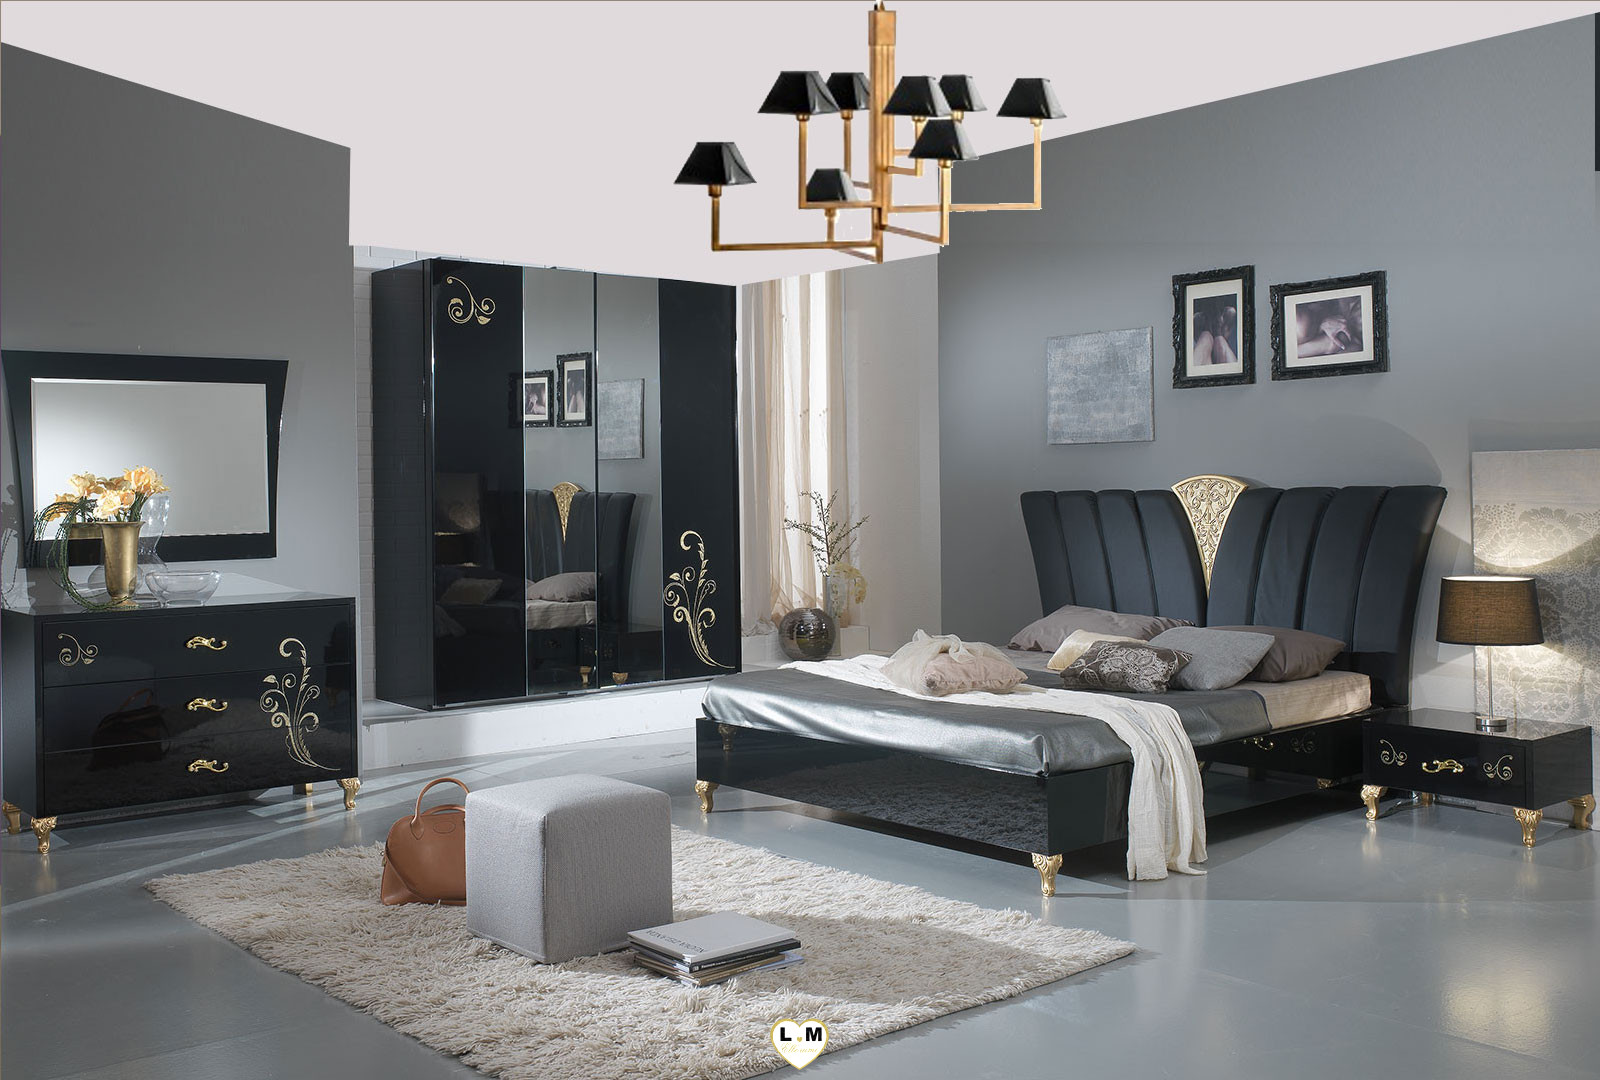 A Coucher Et DesignL'ensemble Dore Laque Noir Chambre Berenice E29IWDH